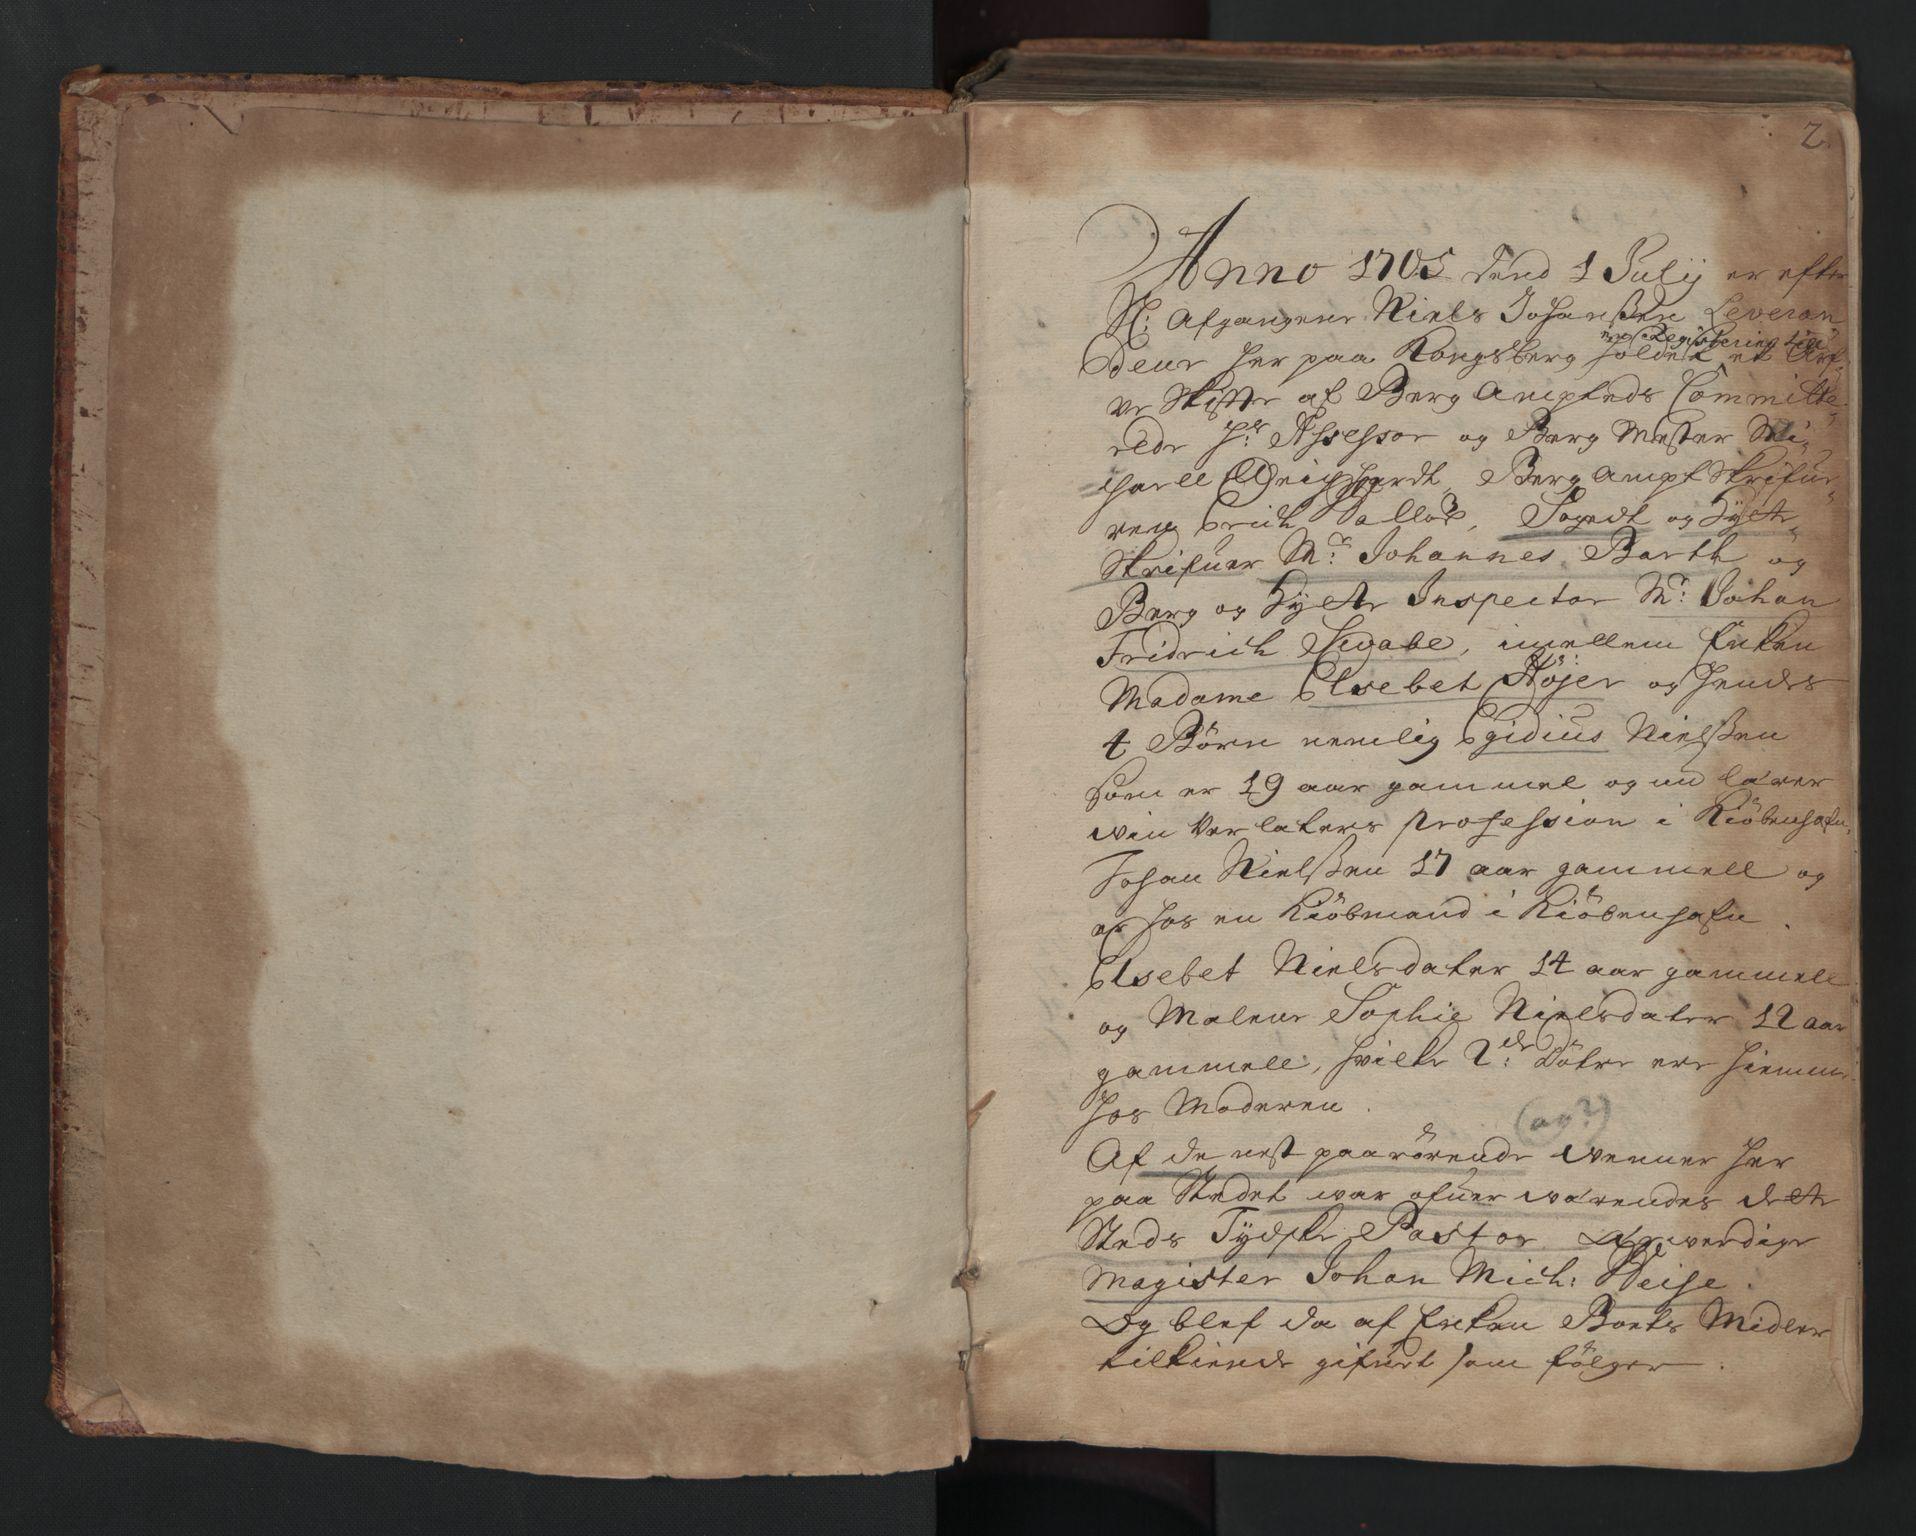 RA, Sønnafjelske bergamt , I/L0001: Skifteprotokoll for Kongsberg bergstad, 1705-1712, s. 1b-2a